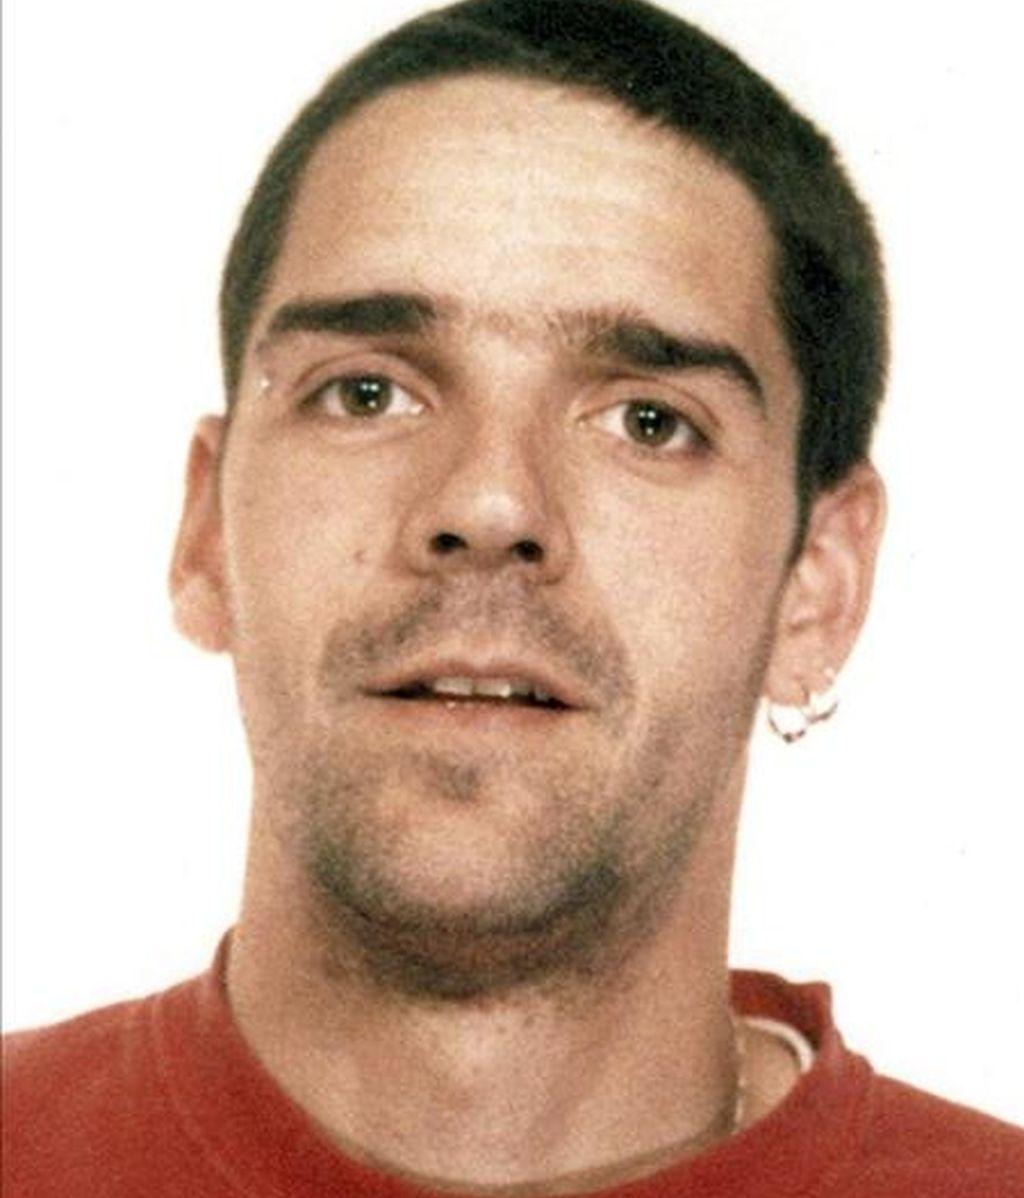 El etarra Garikoitz Etxeberria, ex preso de la ilegalizada Haika (declarada terrorista por el Tribunal Supremo). EFE/Archivo